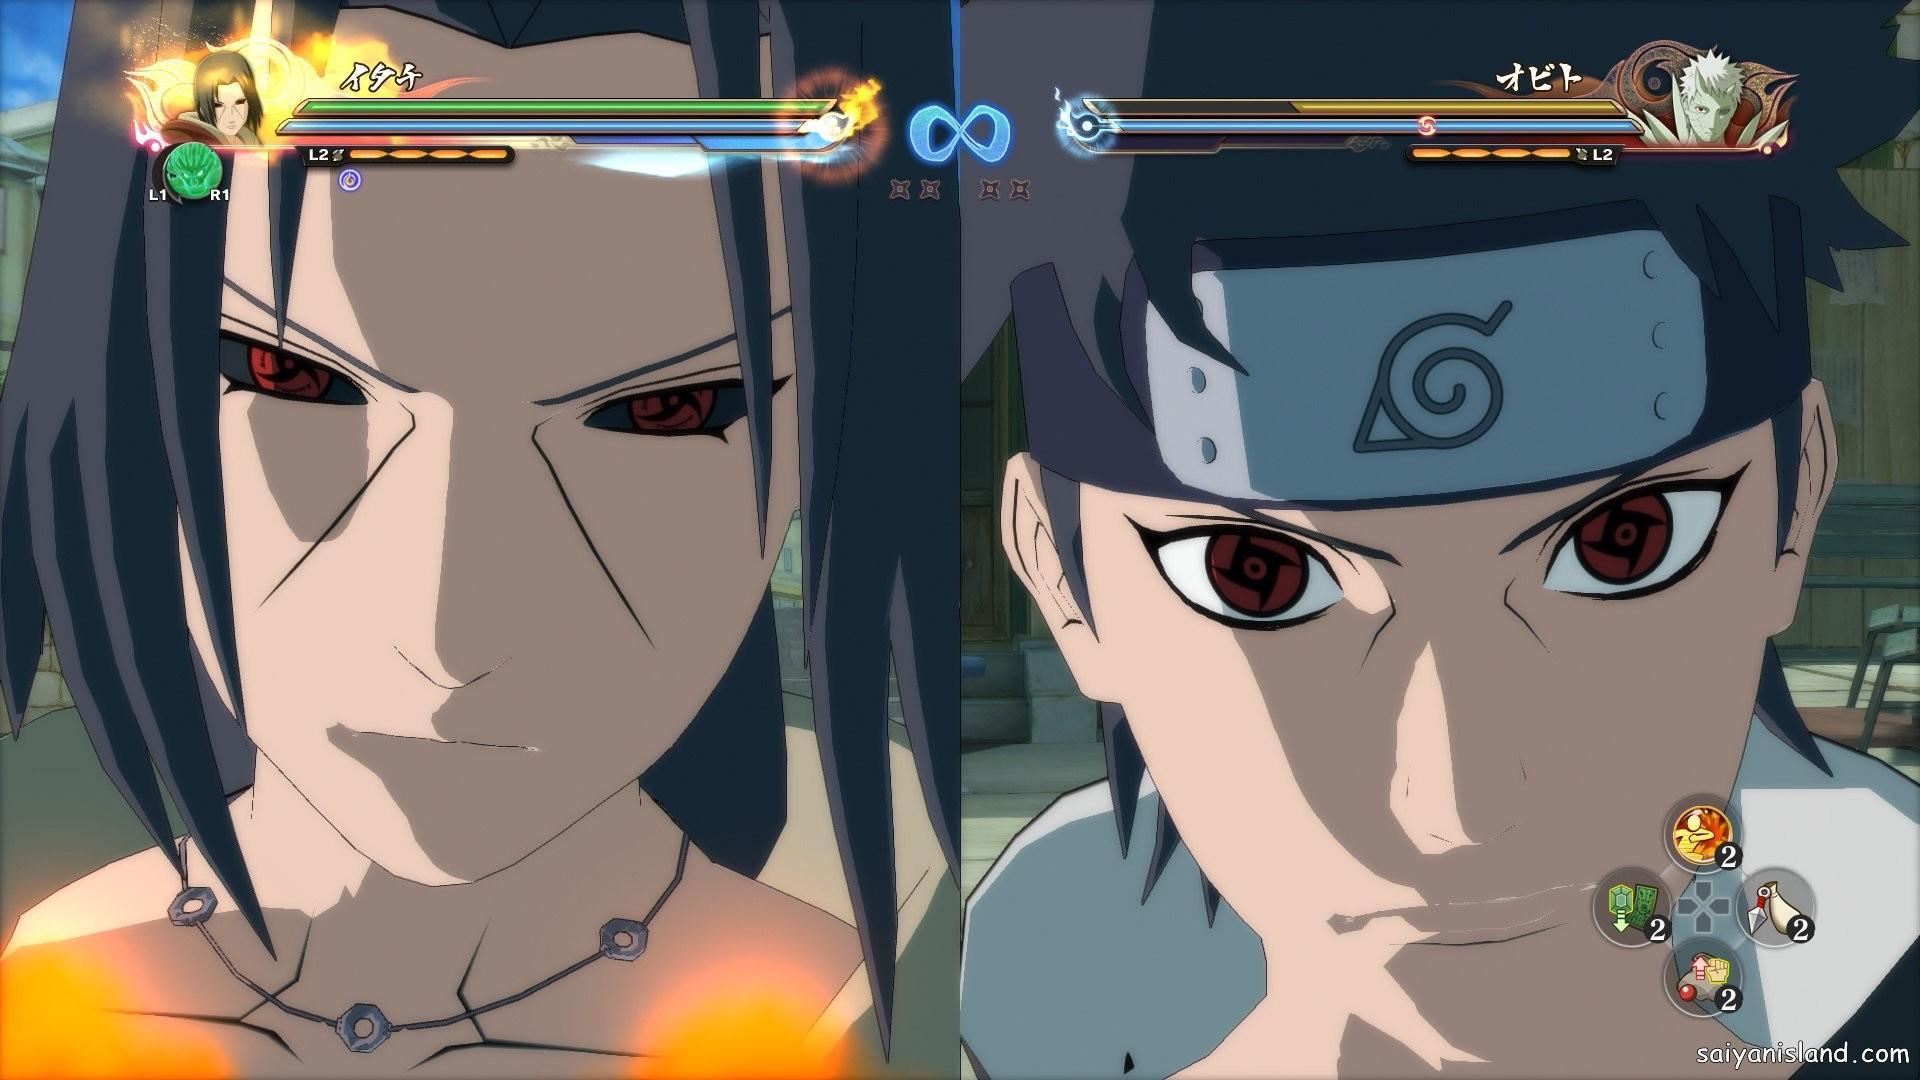 Naruto Storm 4: Perfect Susanoo Shisui and Itachi Screenshots/Art